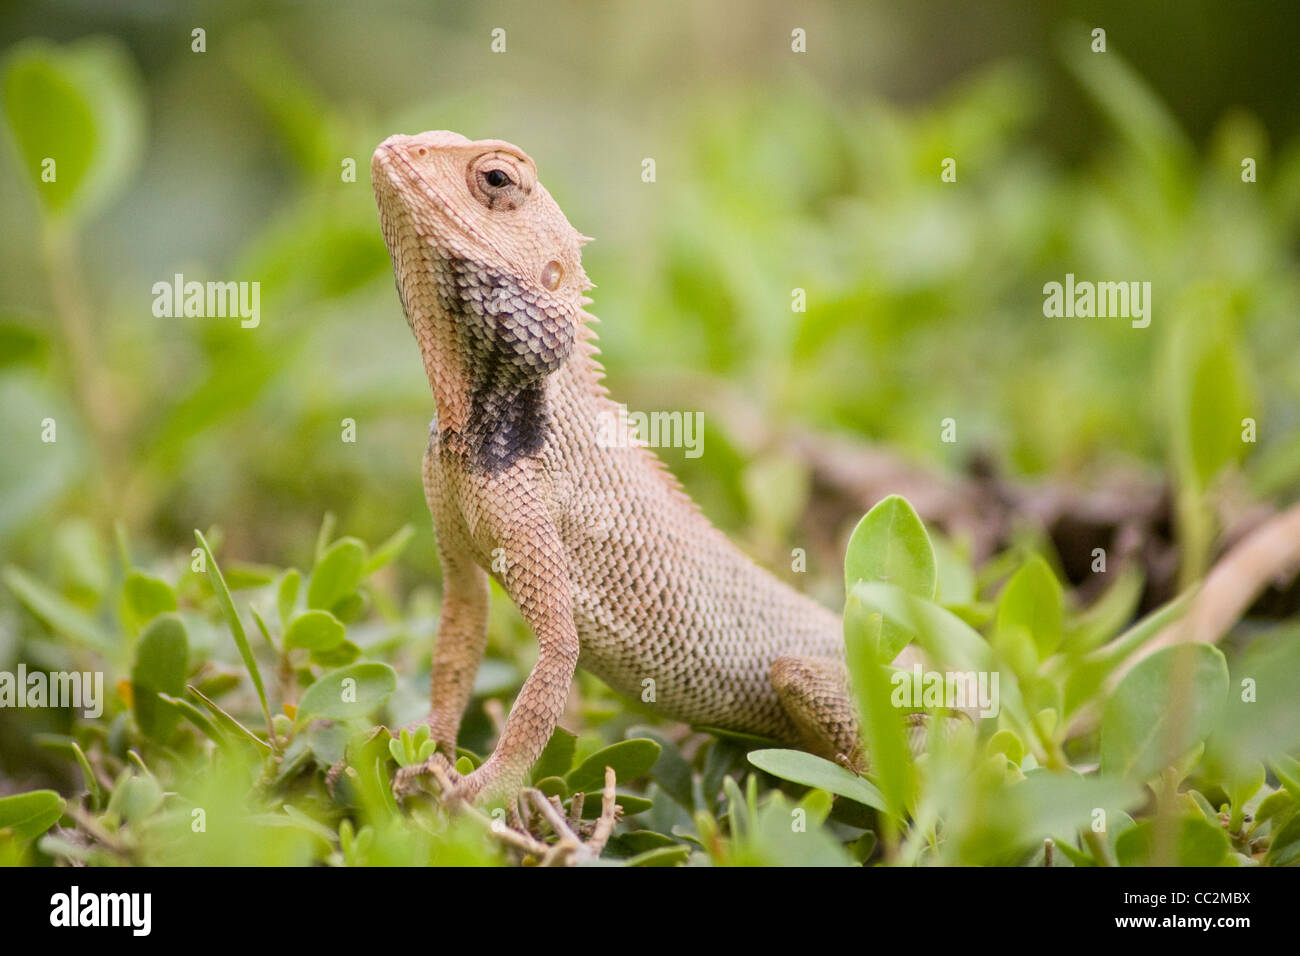 Jardín oriental de la India, Ranthambore lizard Imagen De Stock